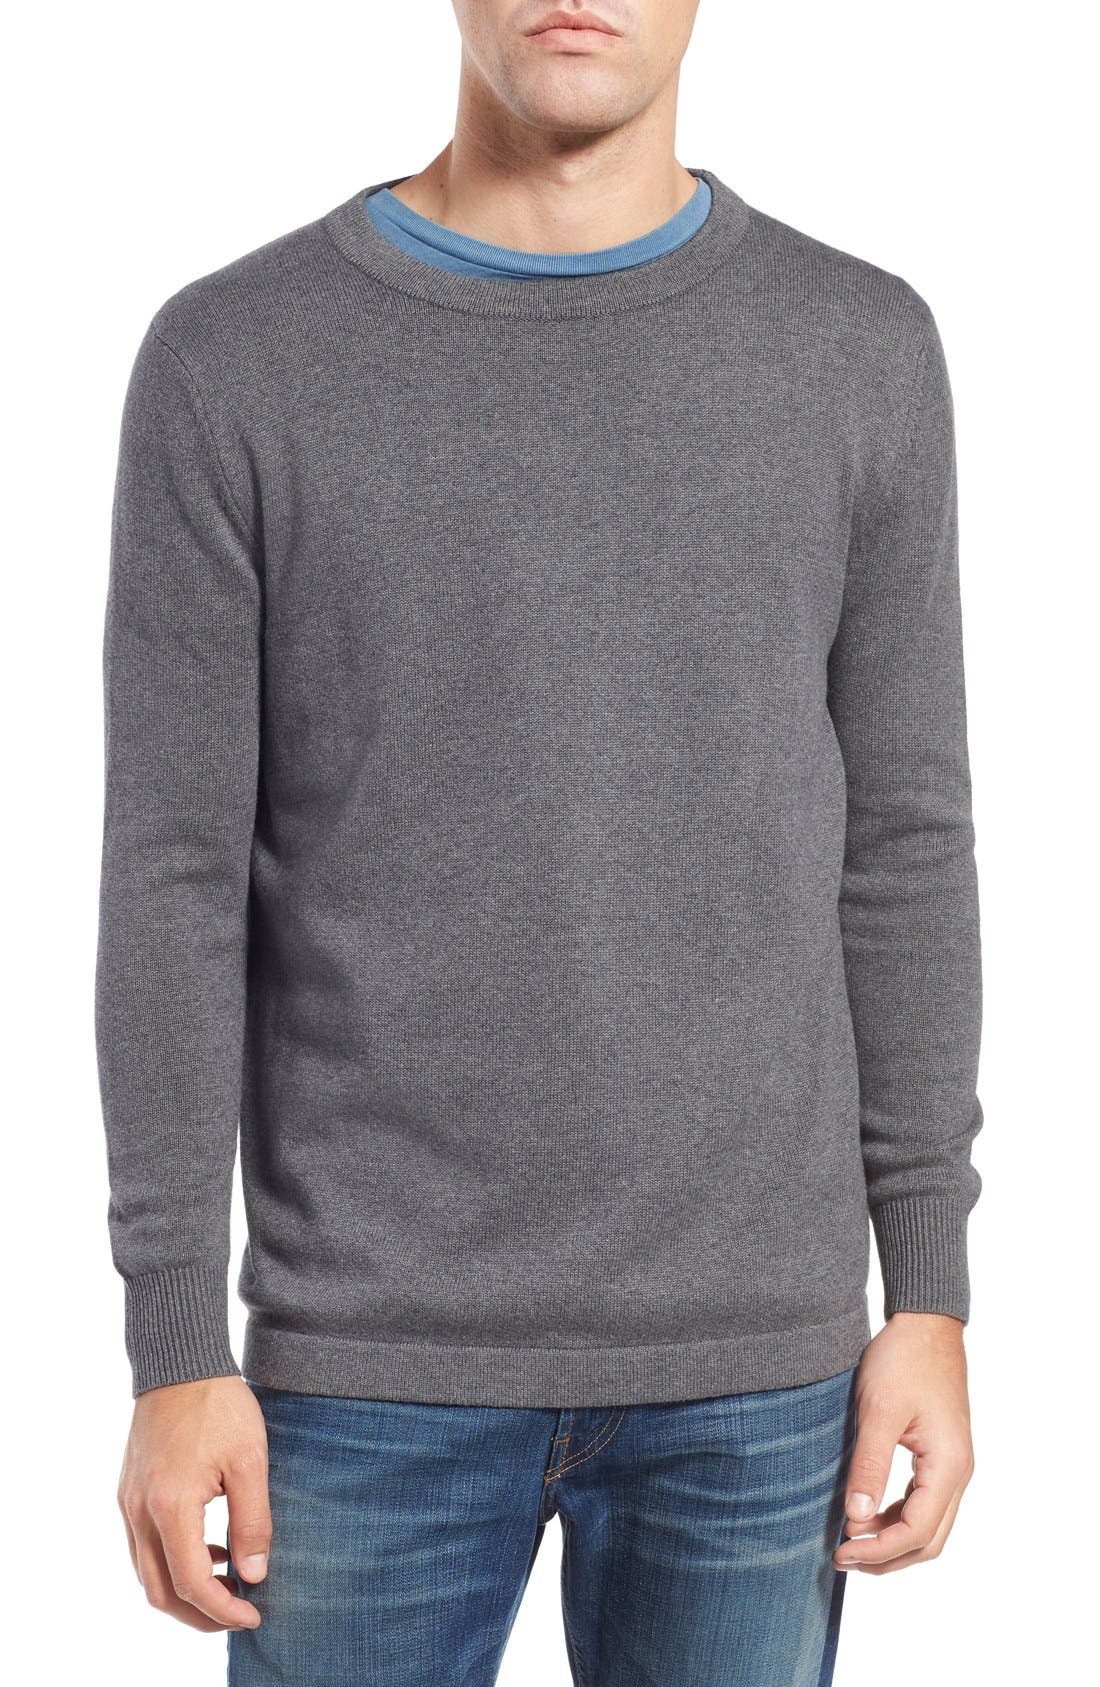 Main Image - Original Paperbacks 'San Francisco' Crewneck Sweater